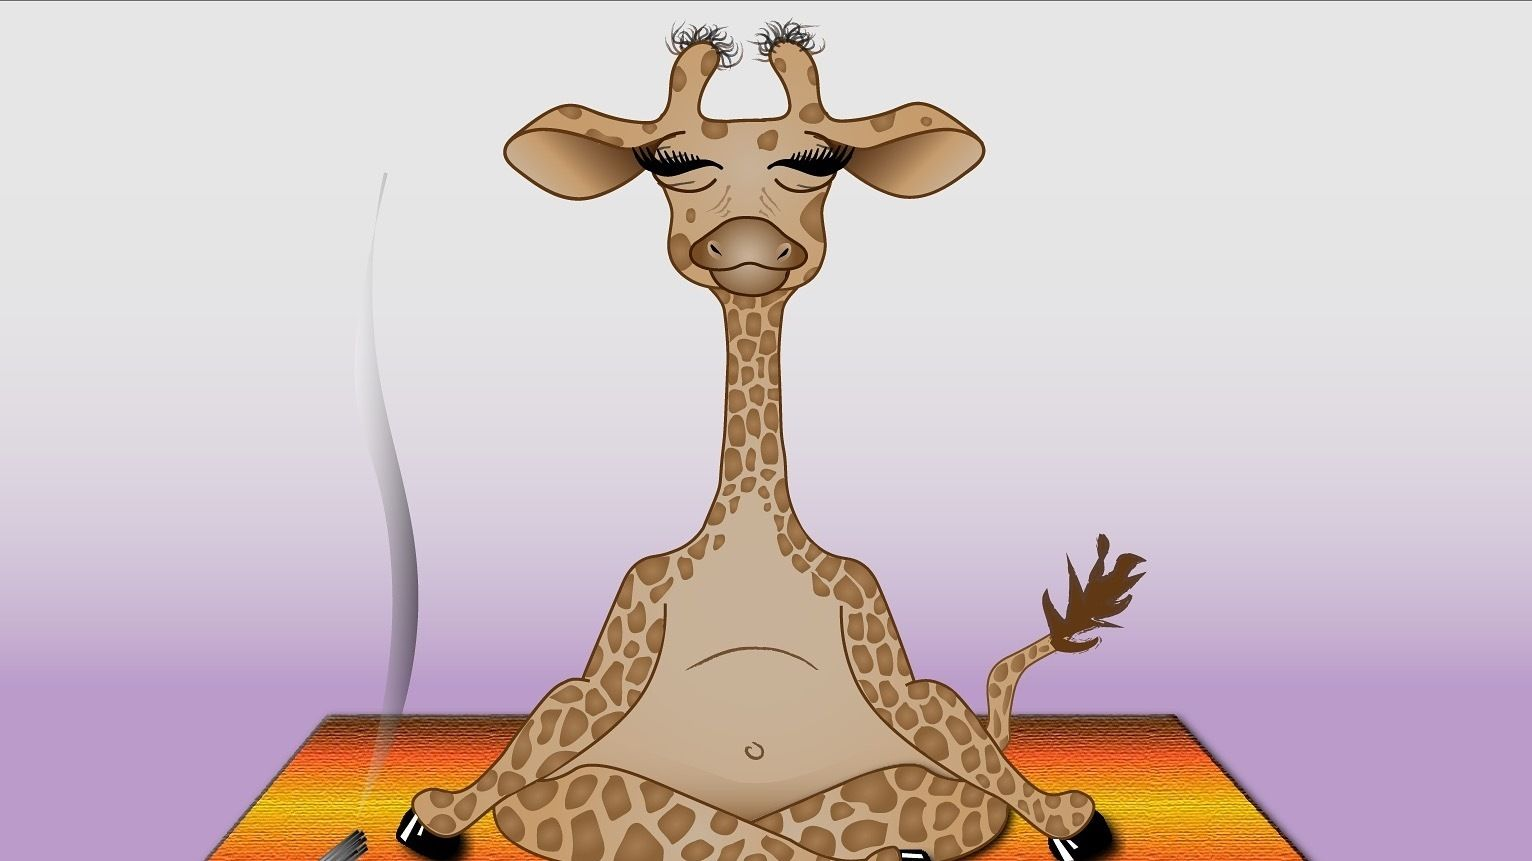 Laughing Giraffe Nonviolent Communication/Meditation Group